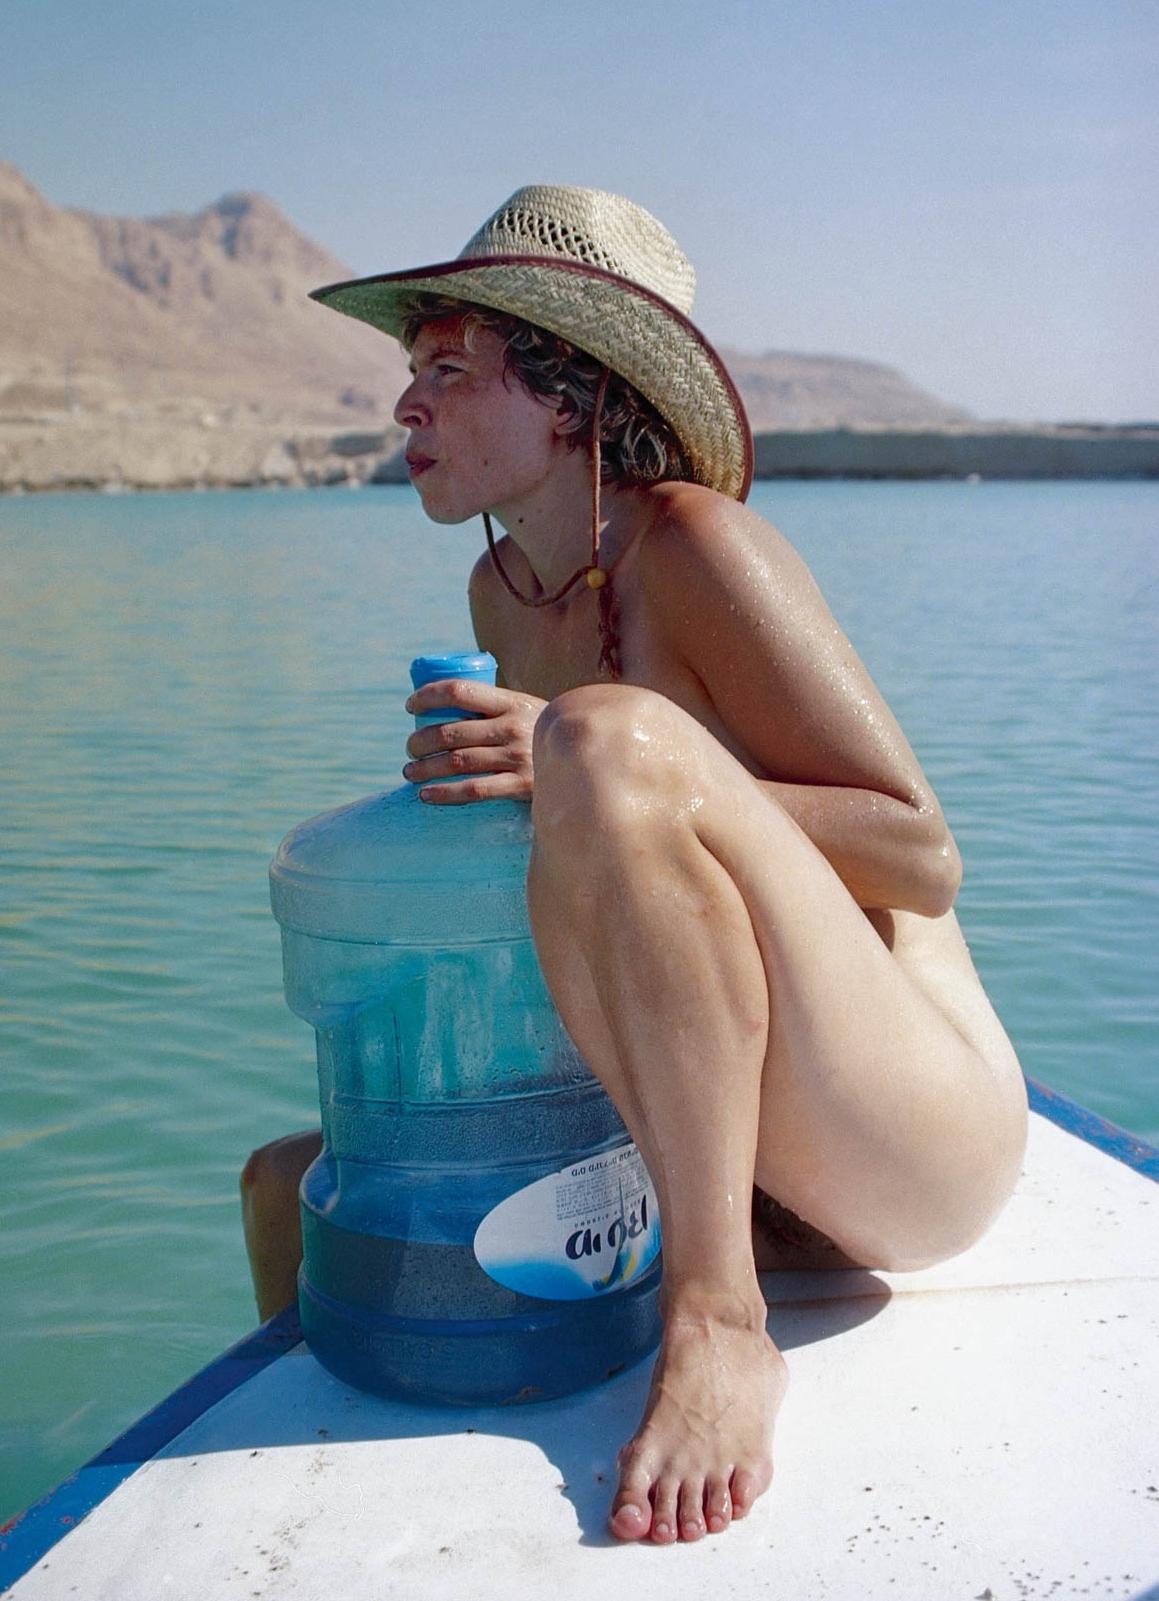 La artista en una tabla de surf. Foto: Masha Rubin © Sigalit Landau, 2019